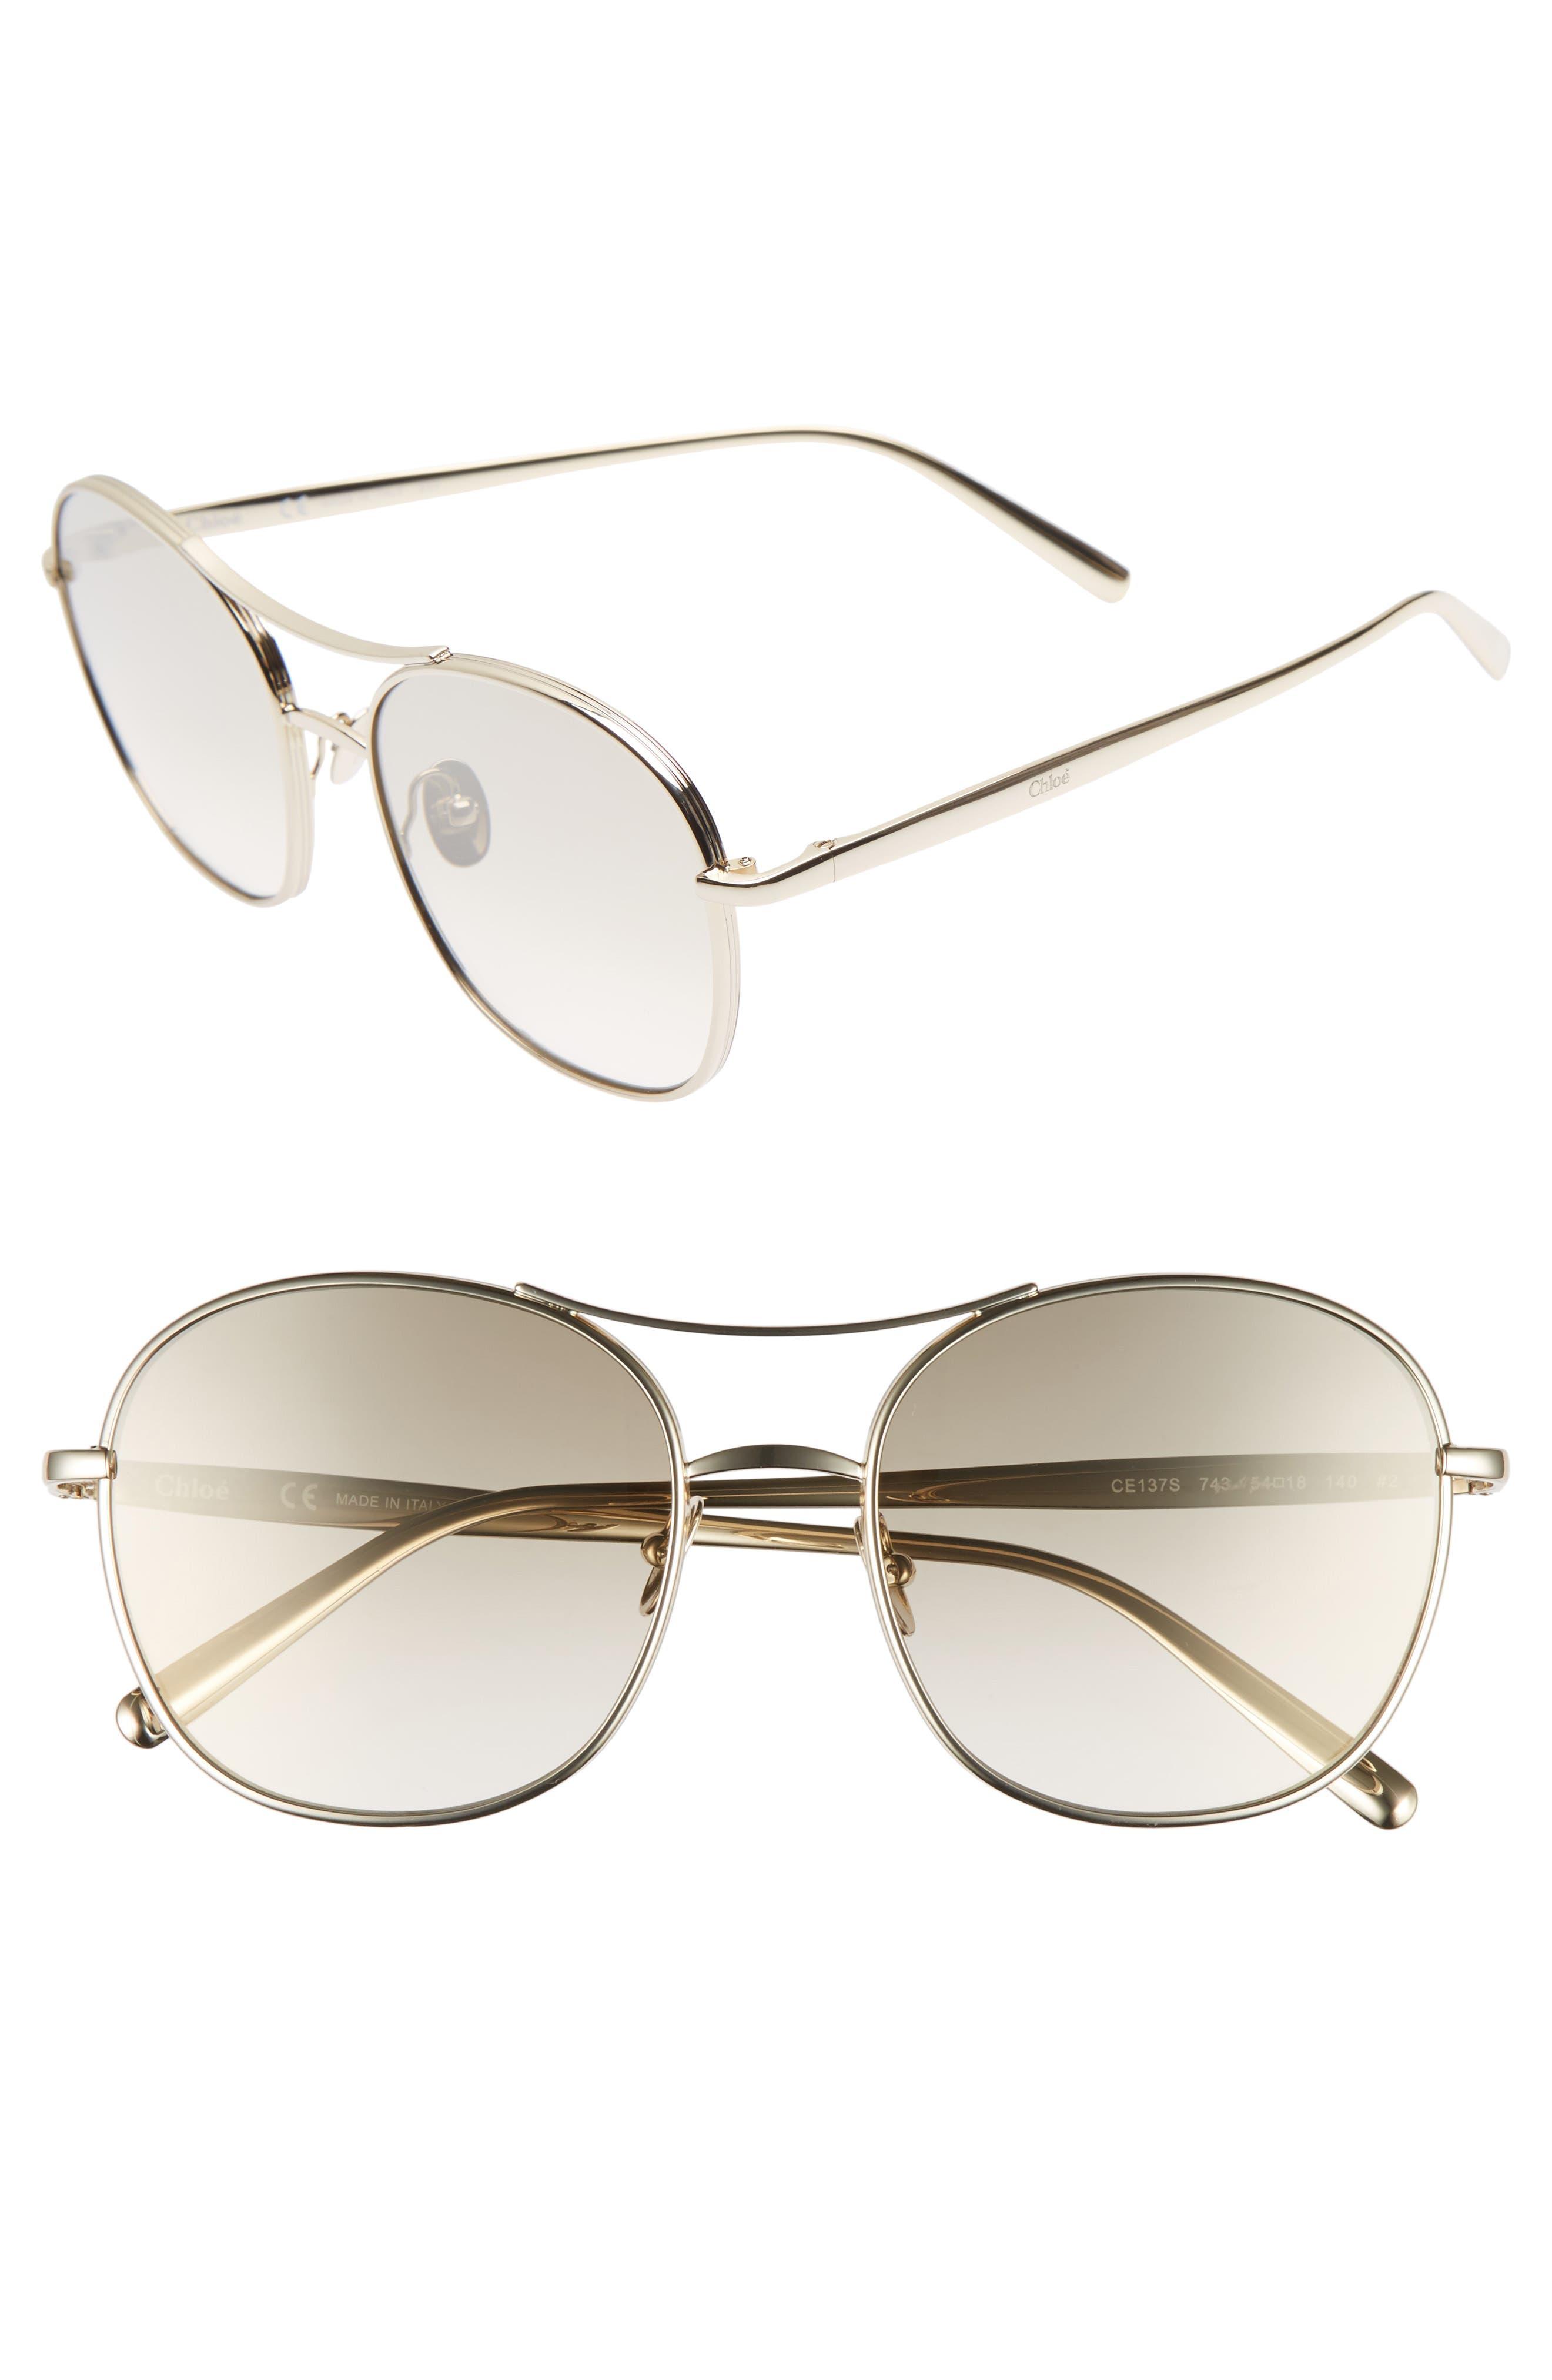 Chloé 54mm Aviator Sunglasses